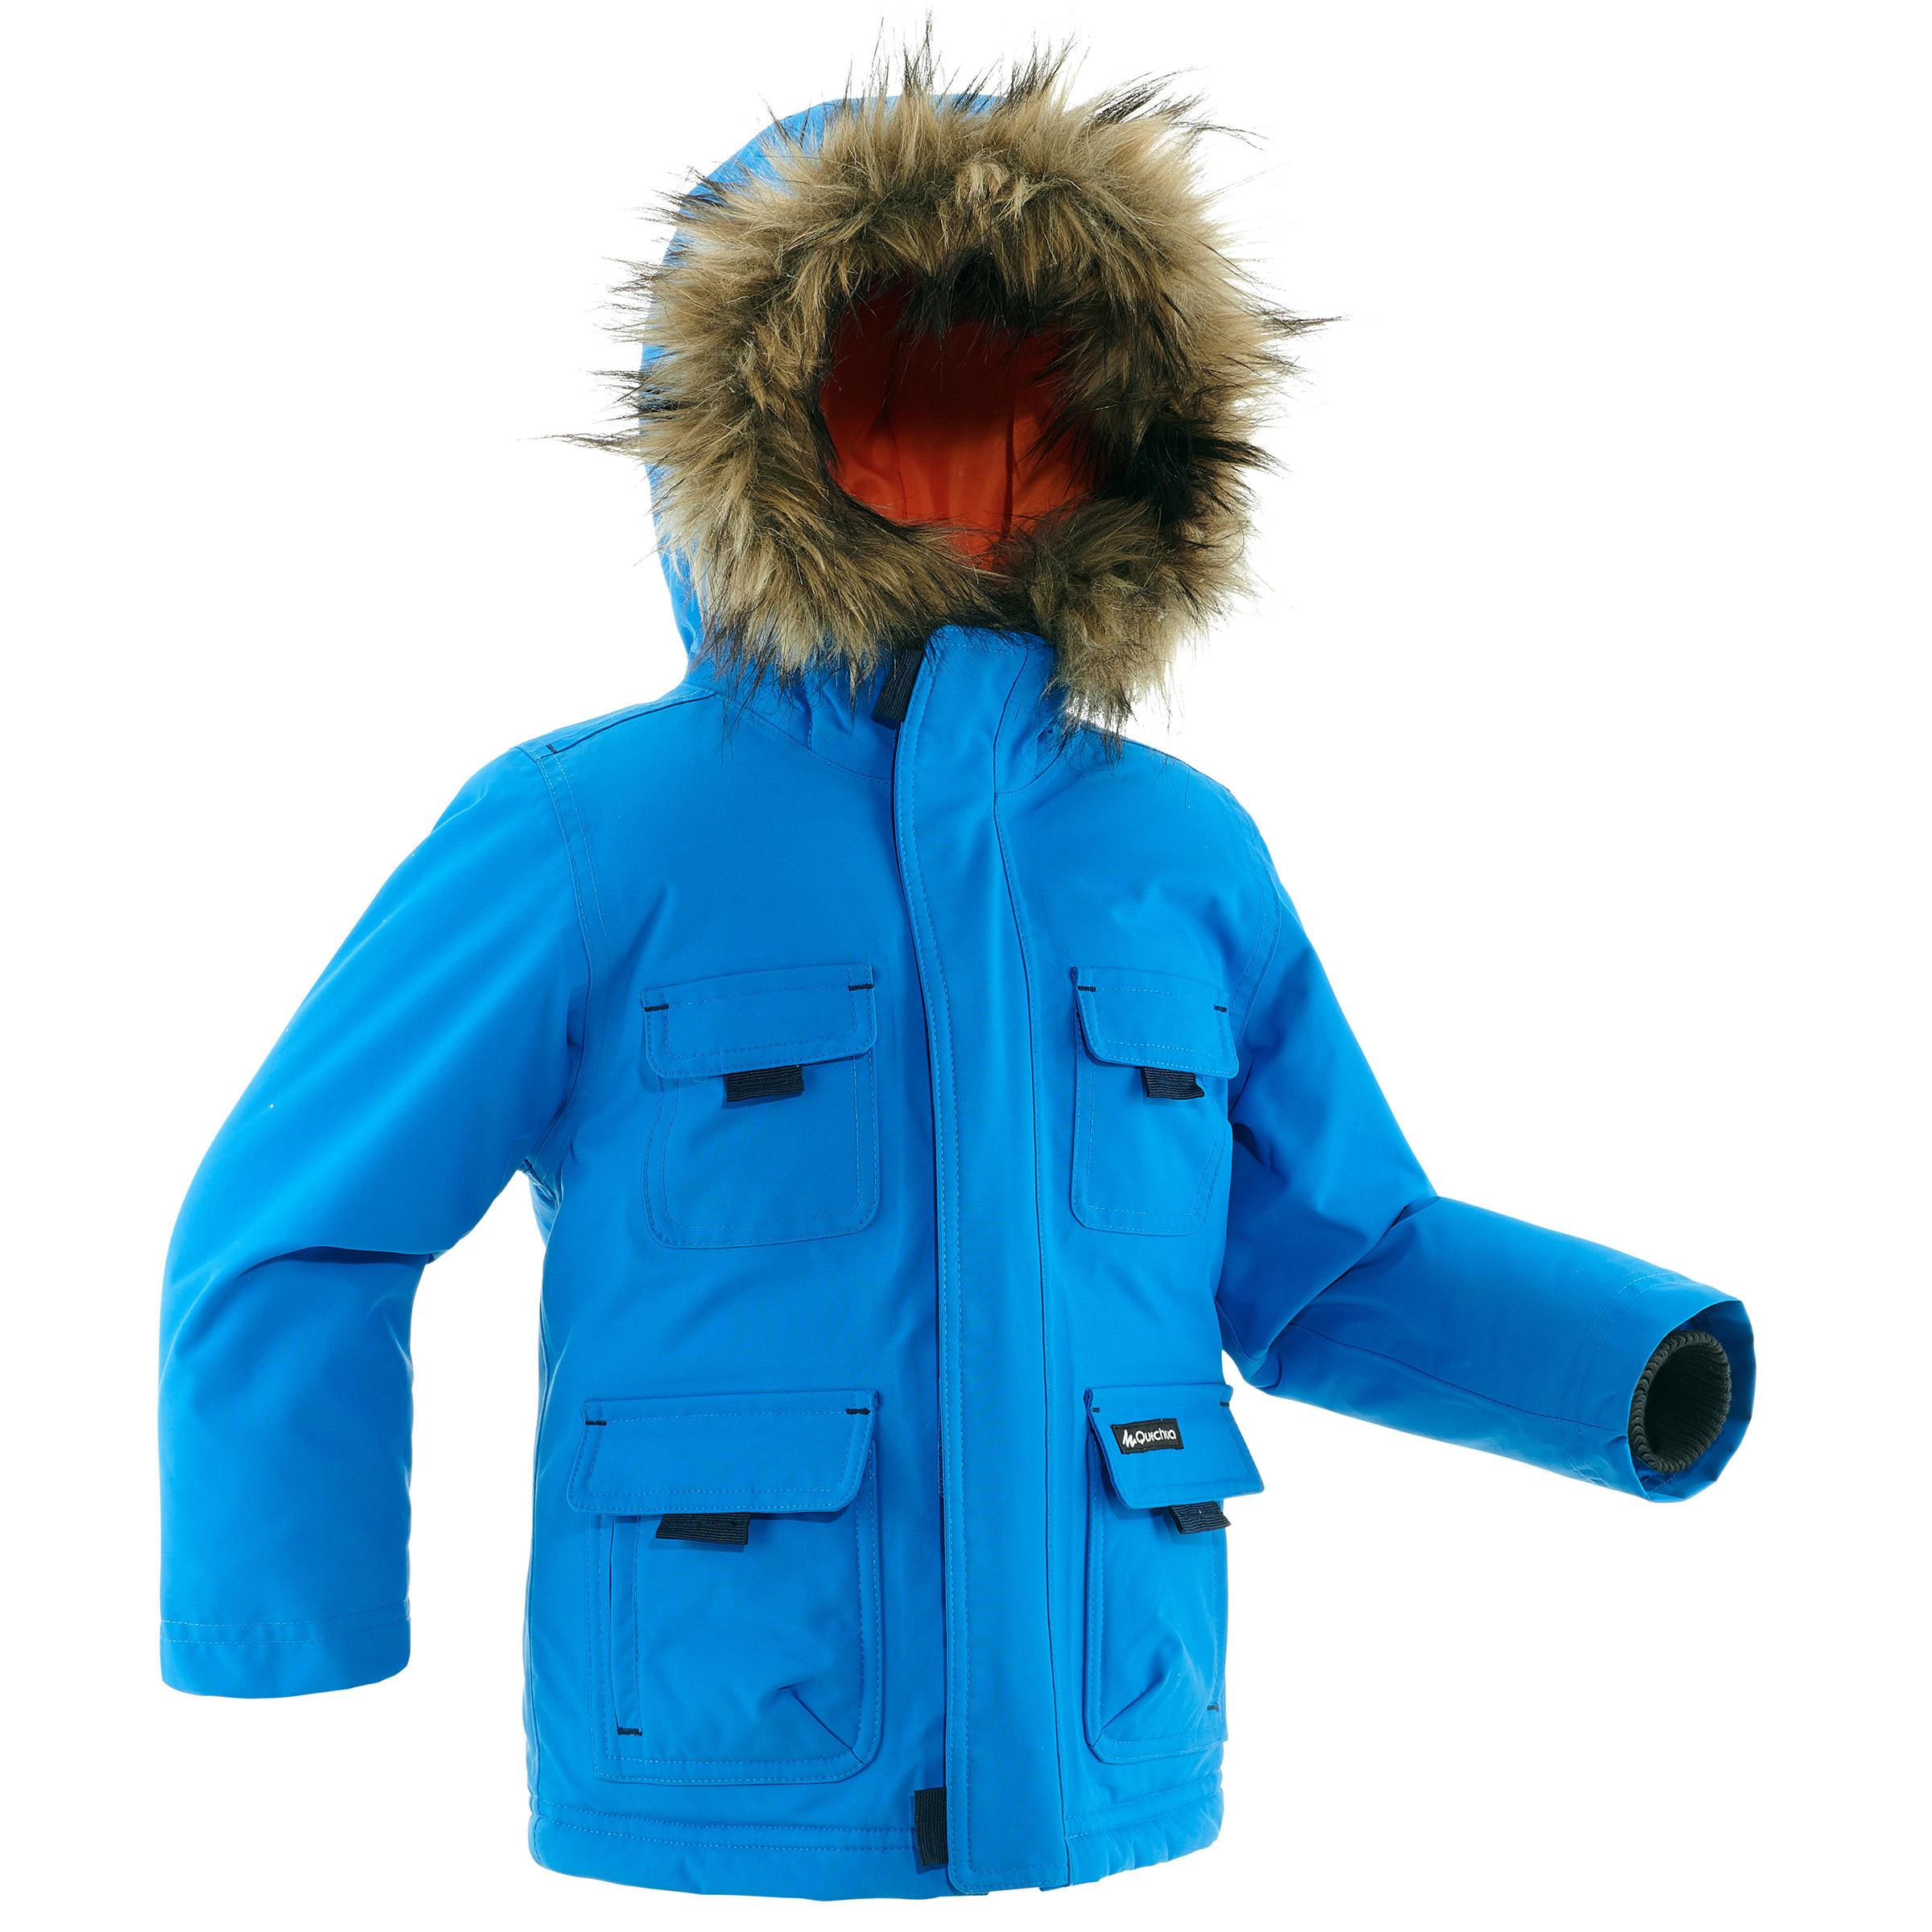 Jungen,Kinder Wanderjacke SH500 X-Warm Kinder blau | 03608439420870